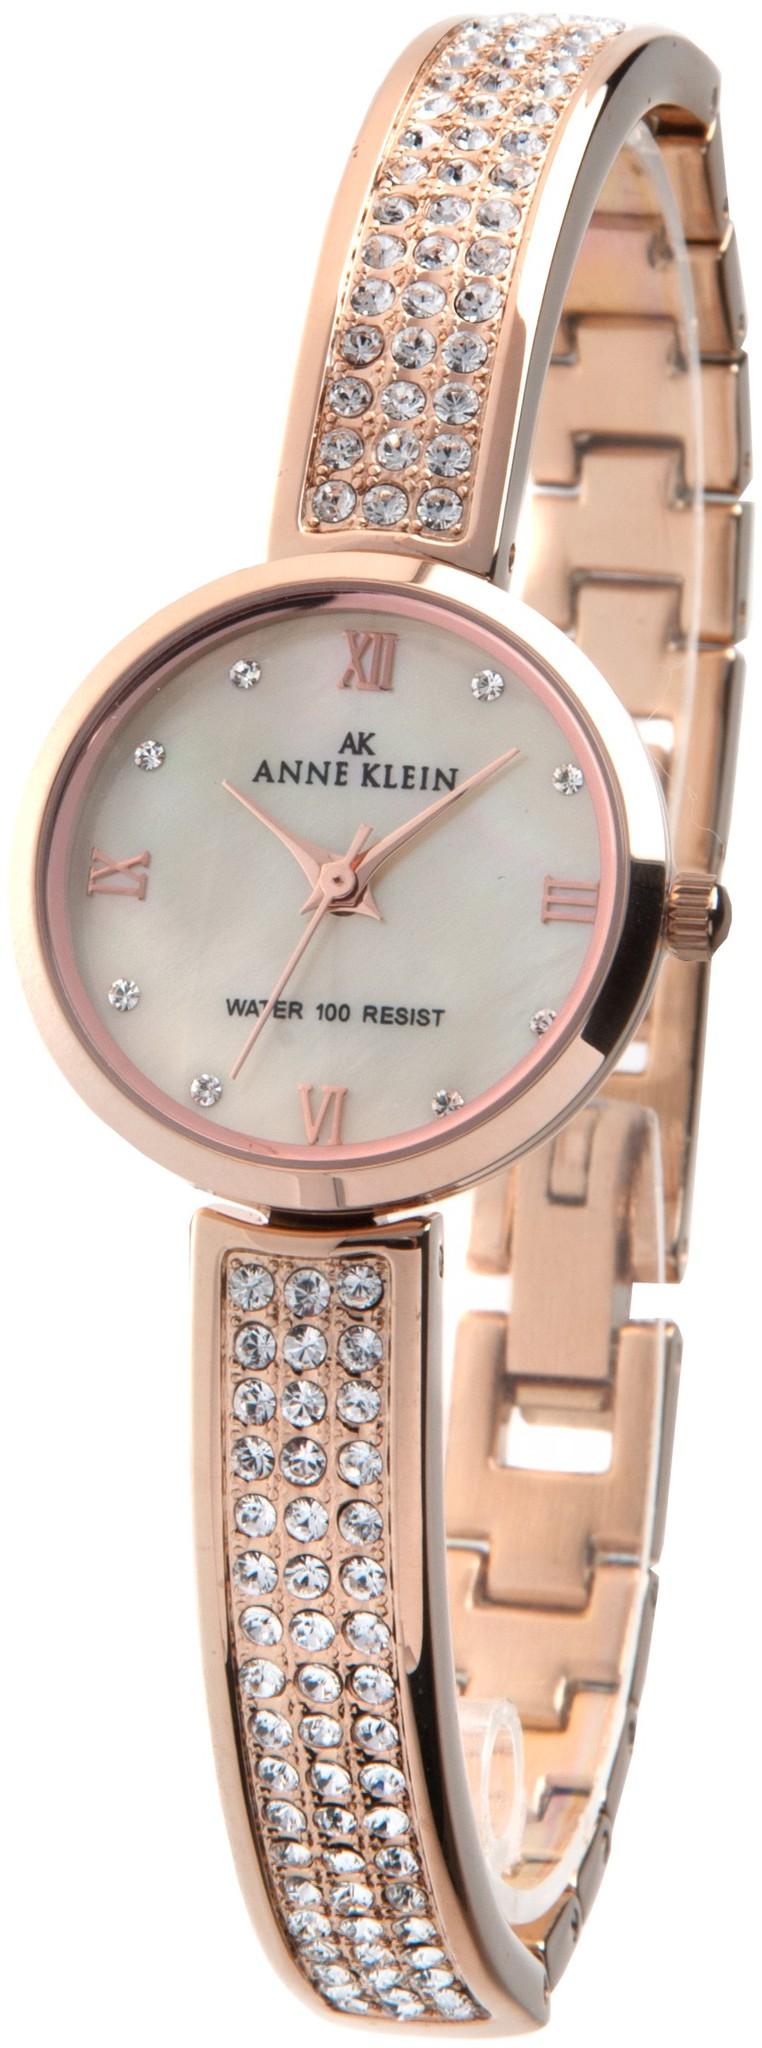 Anne Klein 9786CMRG - женские наручные часы из коллекции CrystalAnne Klein<br><br><br>Бренд: Anne Klein<br>Модель: Anne Klein 9786 CMRG<br>Артикул: 9786CMRG<br>Вариант артикула: None<br>Коллекция: Crystal<br>Подколлекция: None<br>Страна: США<br>Пол: женские<br>Тип механизма: кварцевые<br>Механизм: None<br>Количество камней: None<br>Автоподзавод: None<br>Источник энергии: от батарейки<br>Срок службы элемента питания: None<br>Дисплей: стрелки<br>Цифры: римские<br>Водозащита: WR 30<br>Противоударные: None<br>Материал корпуса: не указан, PVD покрытие: позолота (полное)<br>Материал браслета: не указан, PVD покрытие (полное): позолота<br>Материал безеля: None<br>Стекло: минеральное<br>Антибликовое покрытие: None<br>Цвет корпуса: None<br>Цвет браслета: None<br>Цвет циферблата: None<br>Цвет безеля: None<br>Размеры: 23 мм<br>Диаметр: None<br>Диаметр корпуса: None<br>Толщина: None<br>Ширина ремешка: None<br>Вес: None<br>Спорт-функции: None<br>Подсветка: None<br>Вставка: кристаллы Swarovski<br>Отображение даты: None<br>Хронограф: None<br>Таймер: None<br>Термометр: None<br>Хронометр: None<br>GPS: None<br>Радиосинхронизация: None<br>Барометр: None<br>Скелетон: None<br>Дополнительная информация: None<br>Дополнительные функции: None